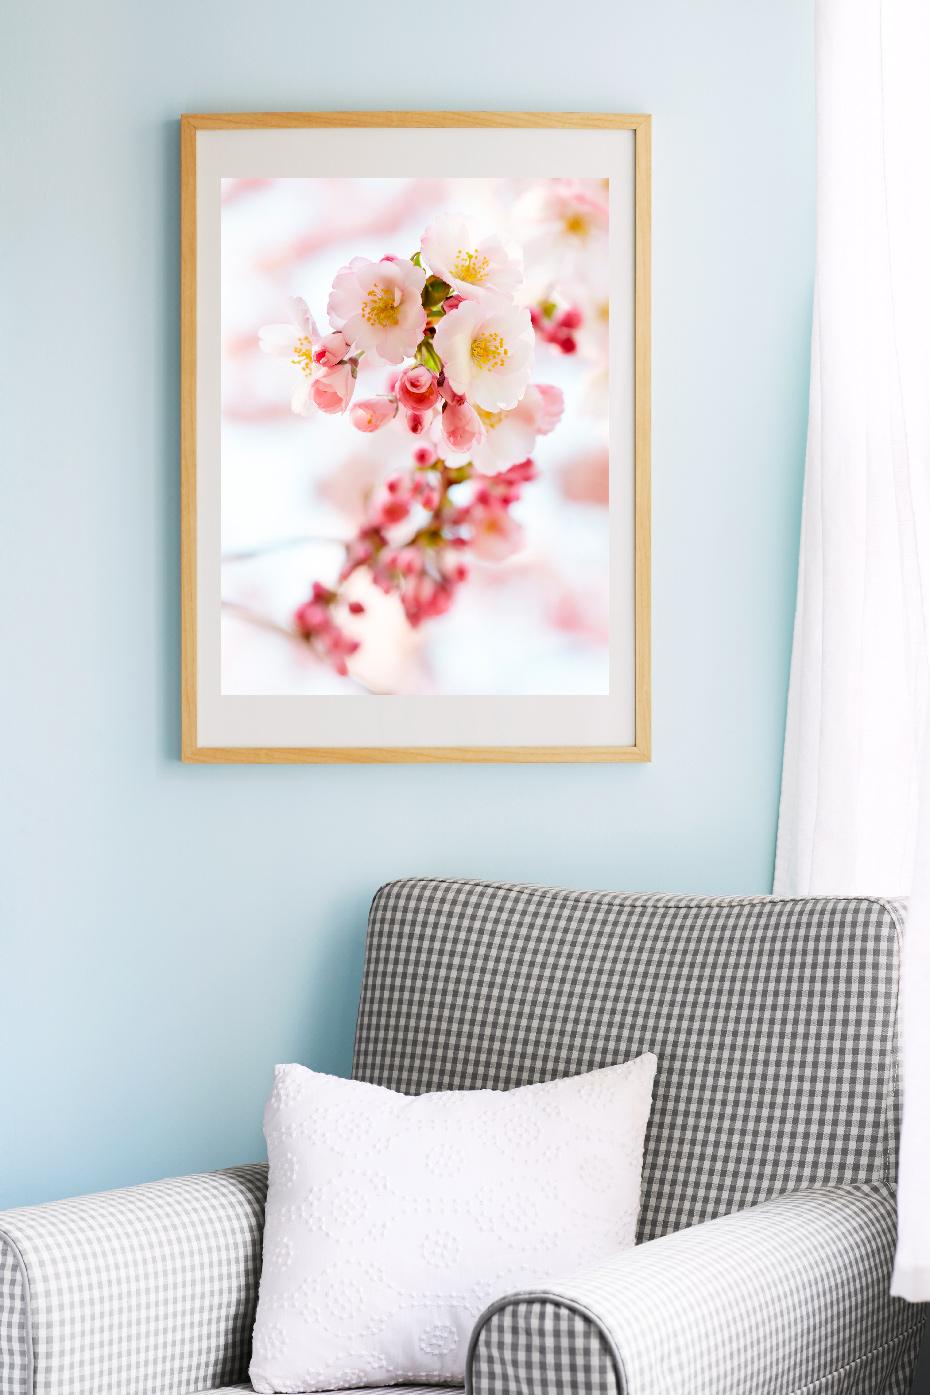 1_blossoms_II.jpg